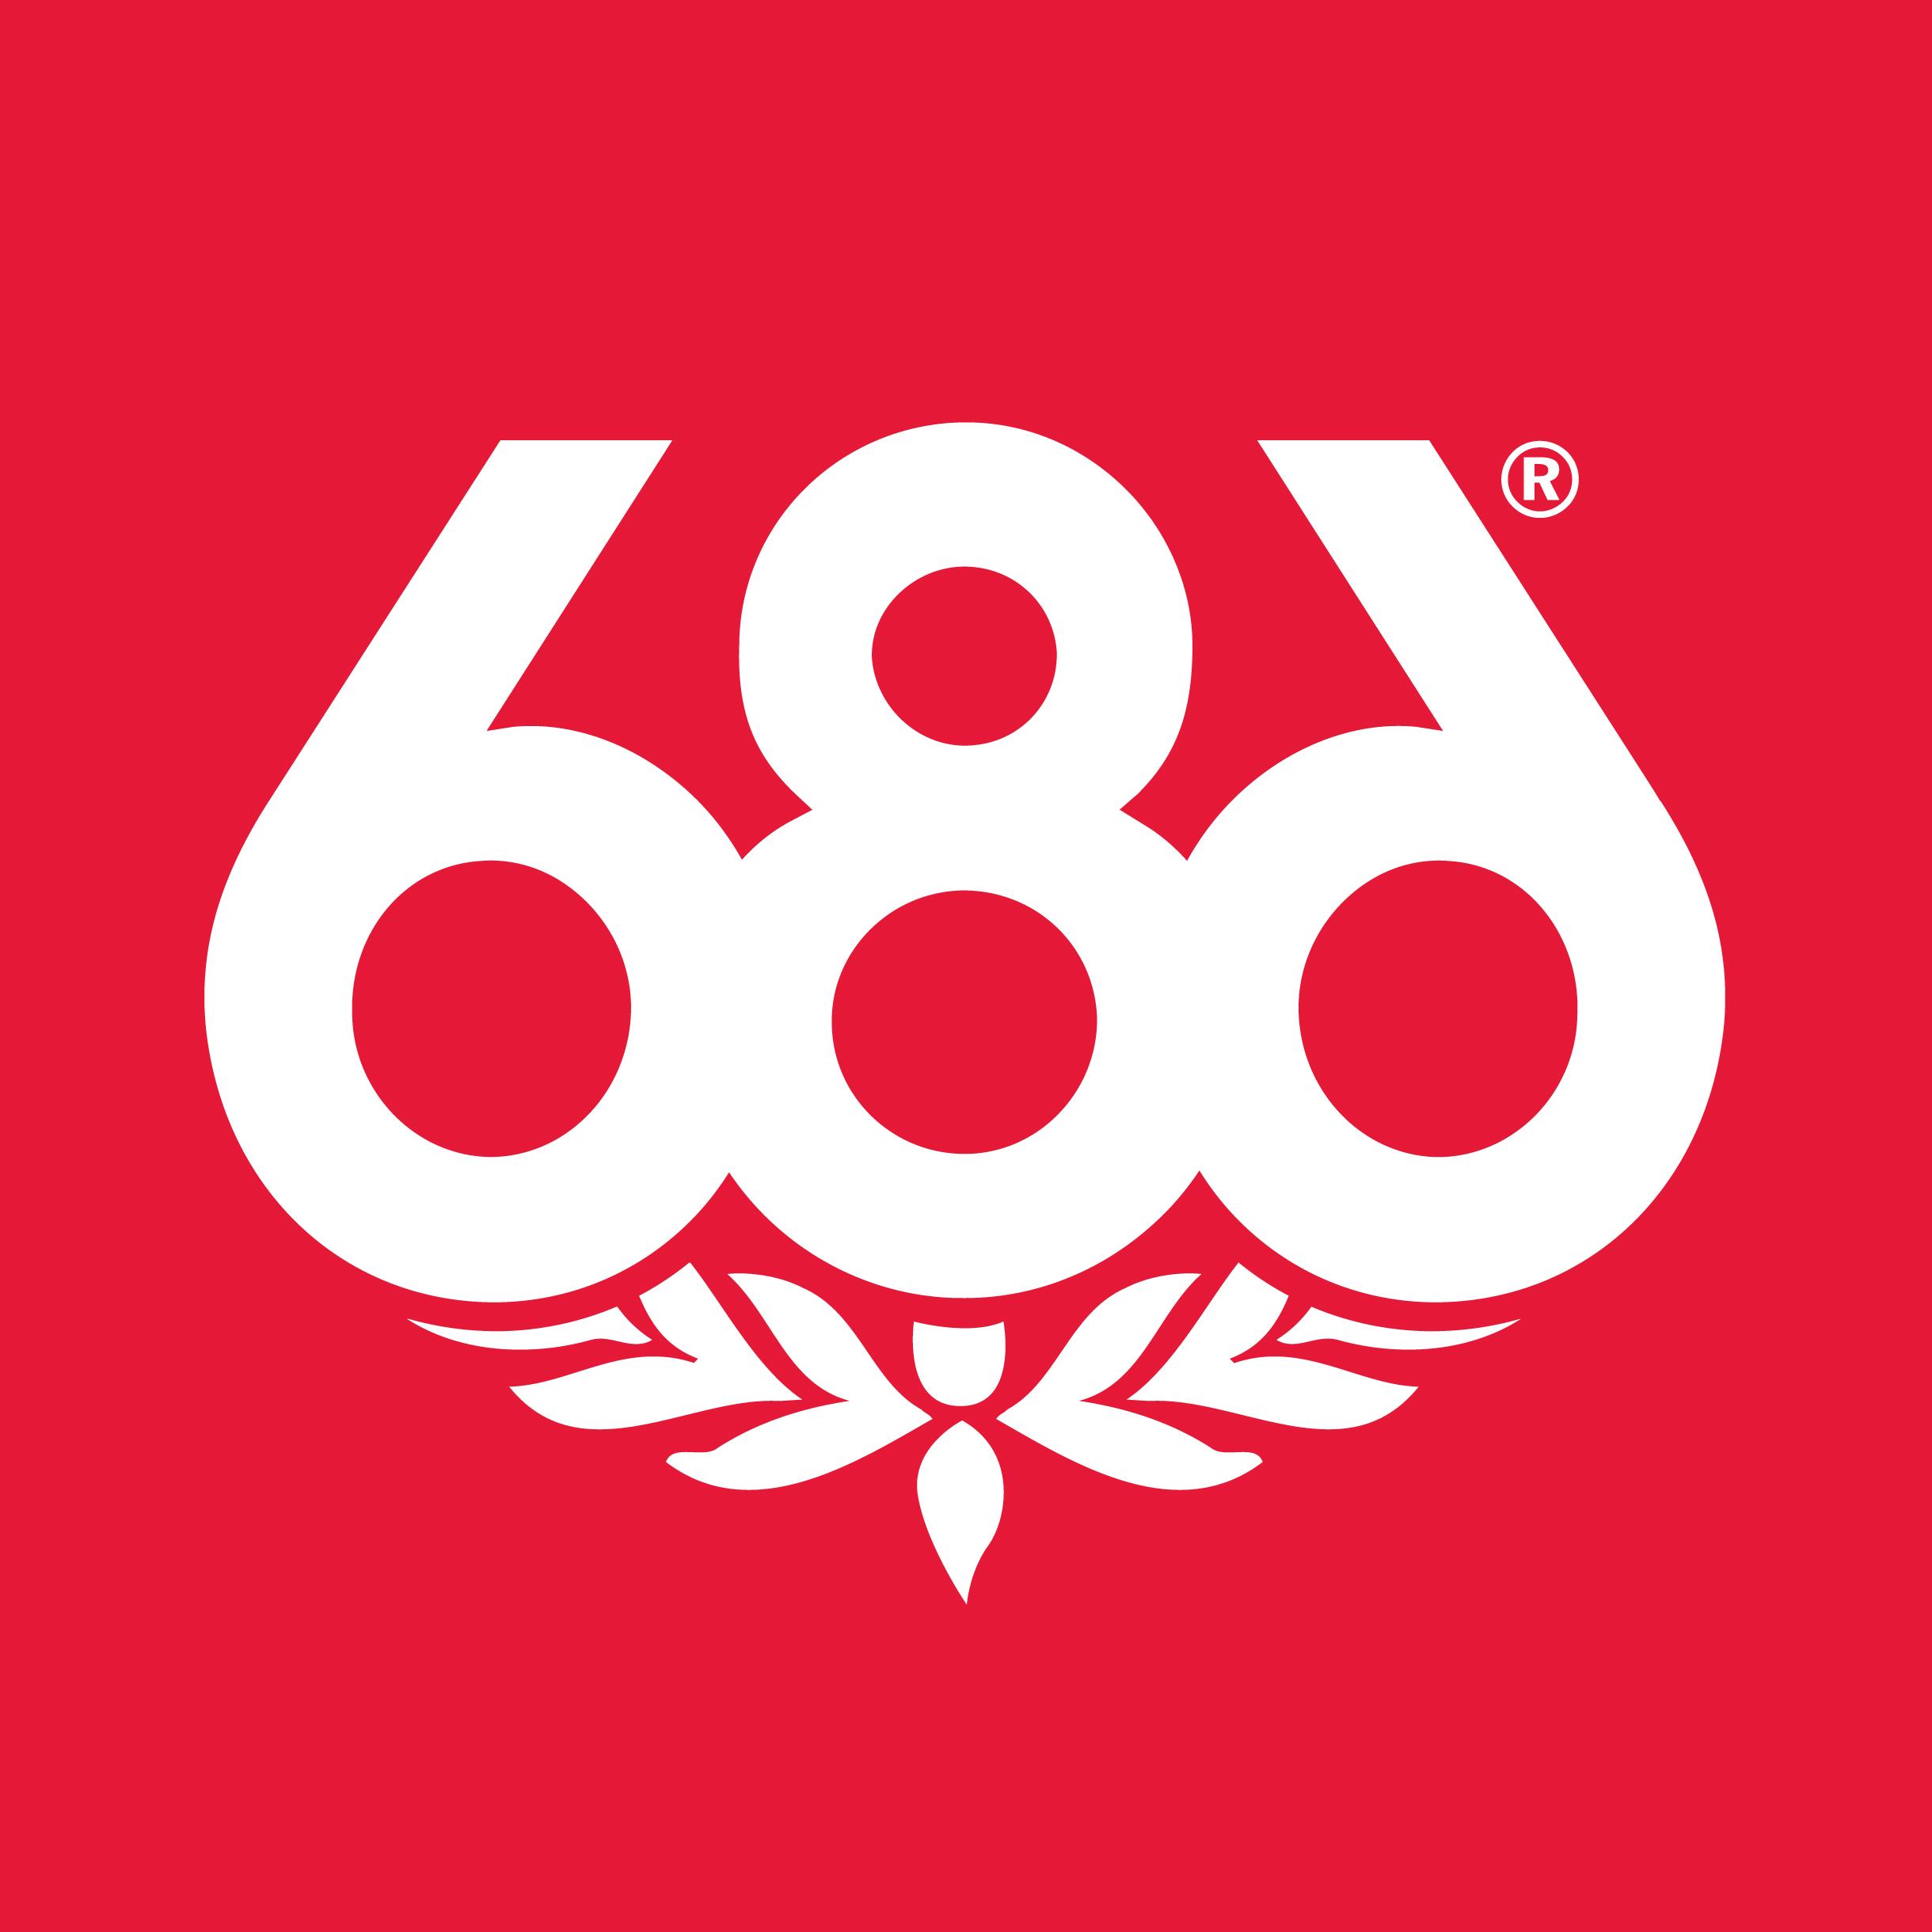 686 Logo.jpg